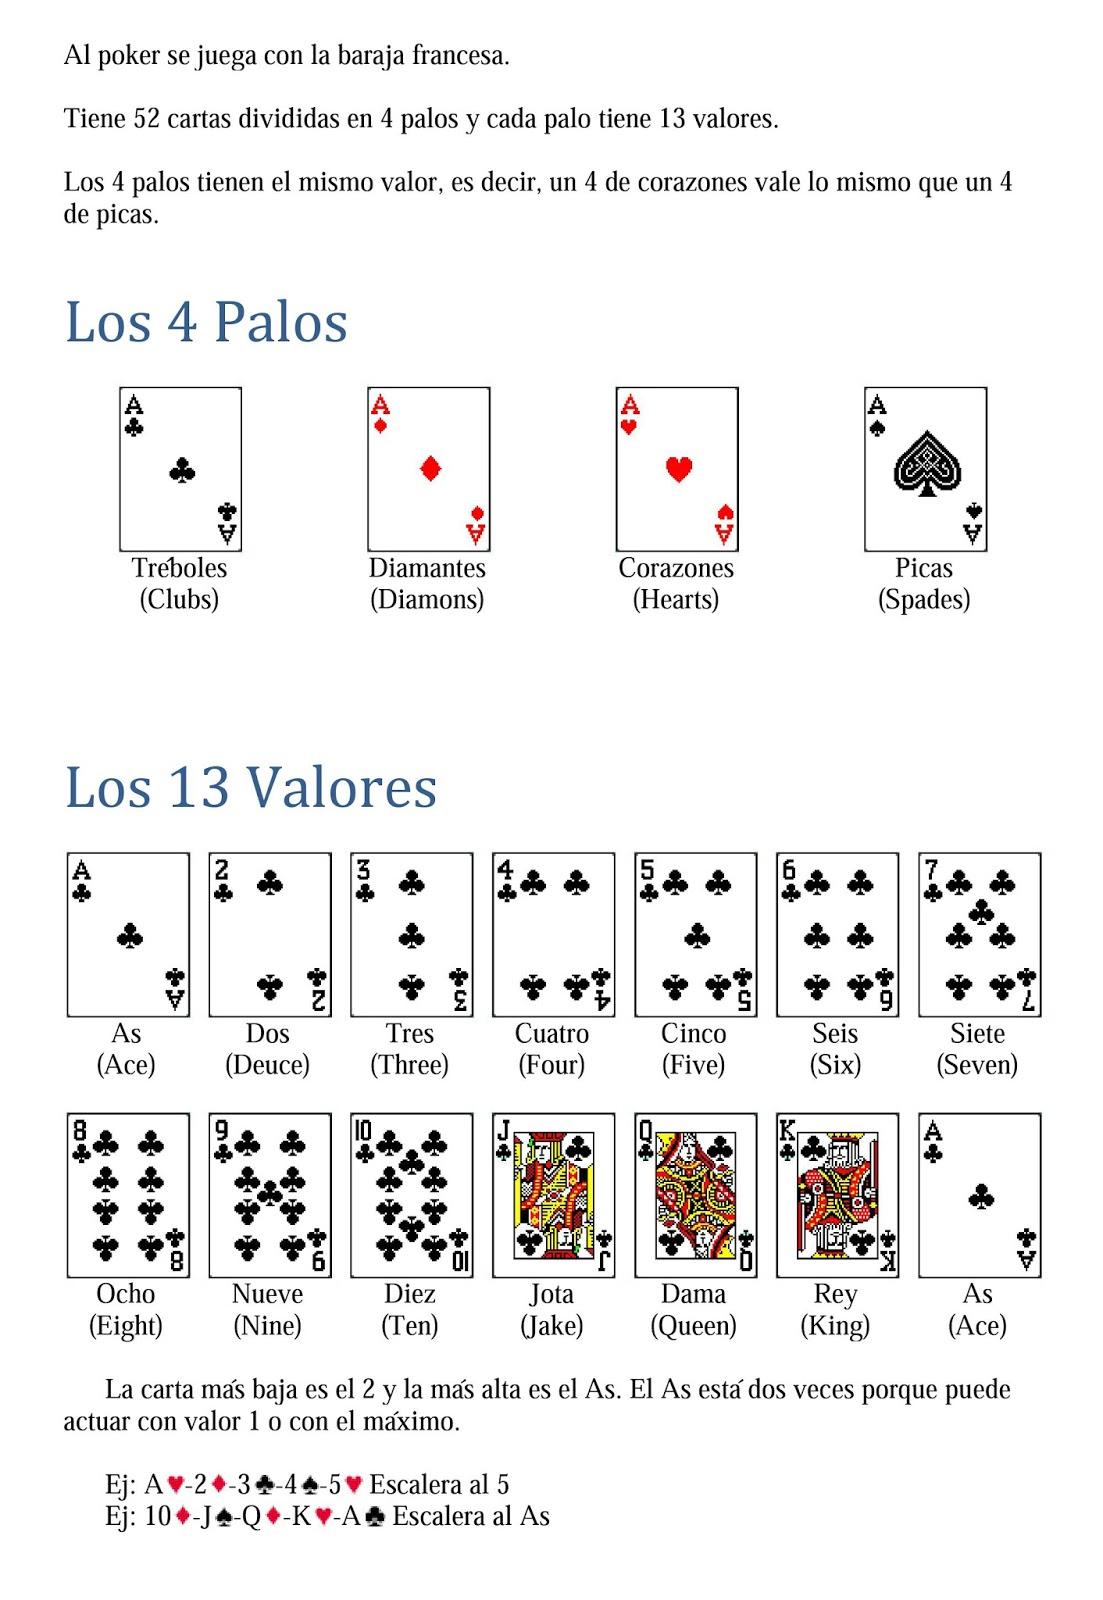 Aprender a jugar poker texas holdem profesional